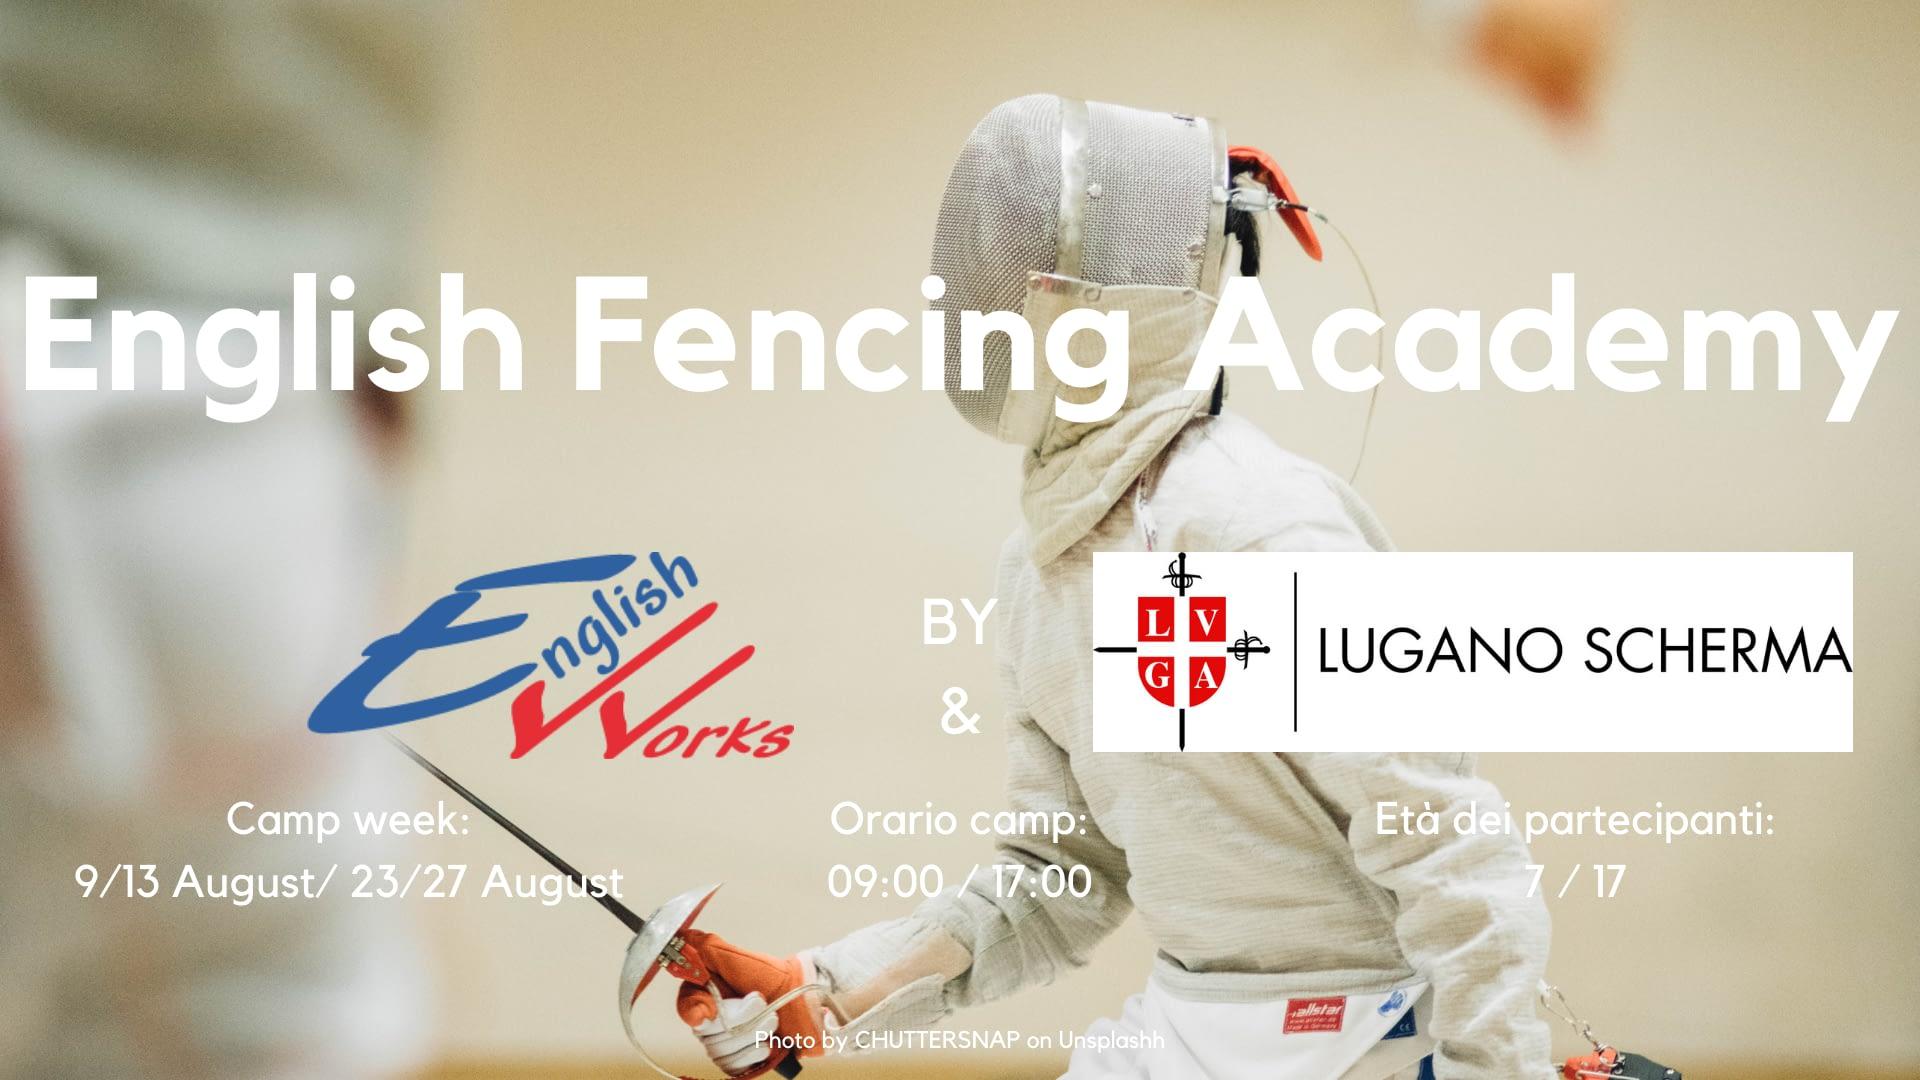 English Fencing Academy